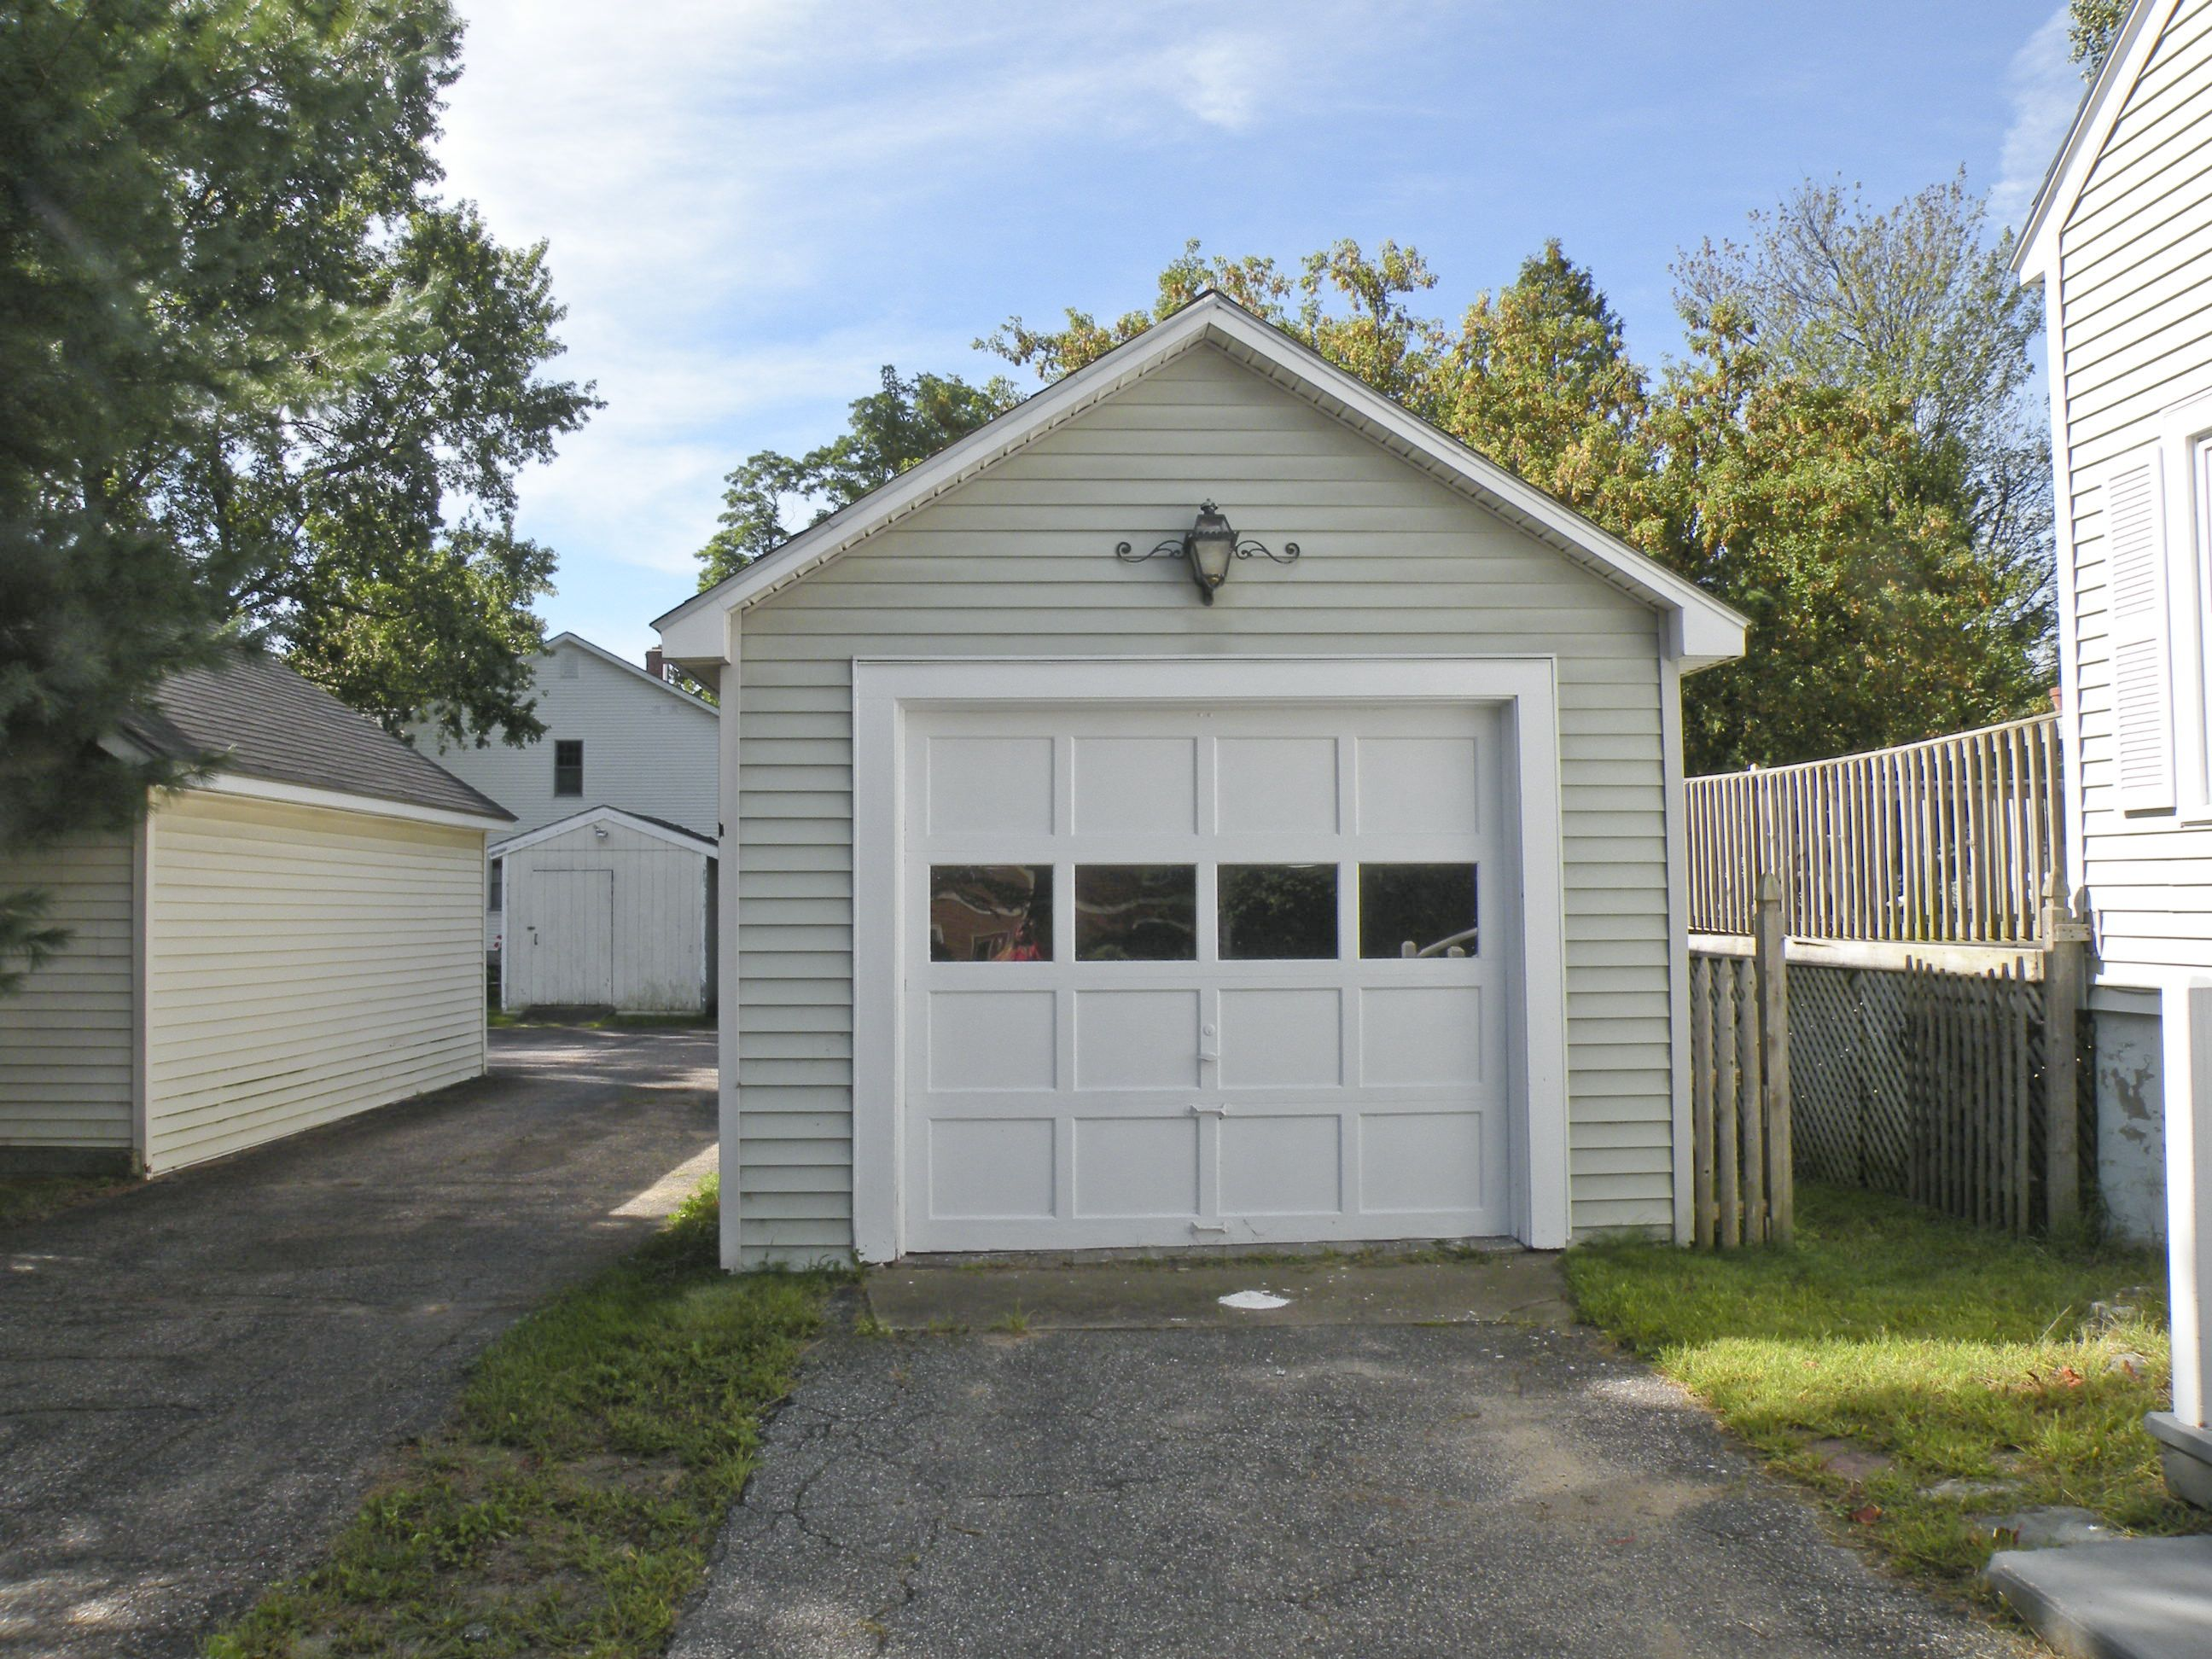 Detached garage garages and garage doors garage plans